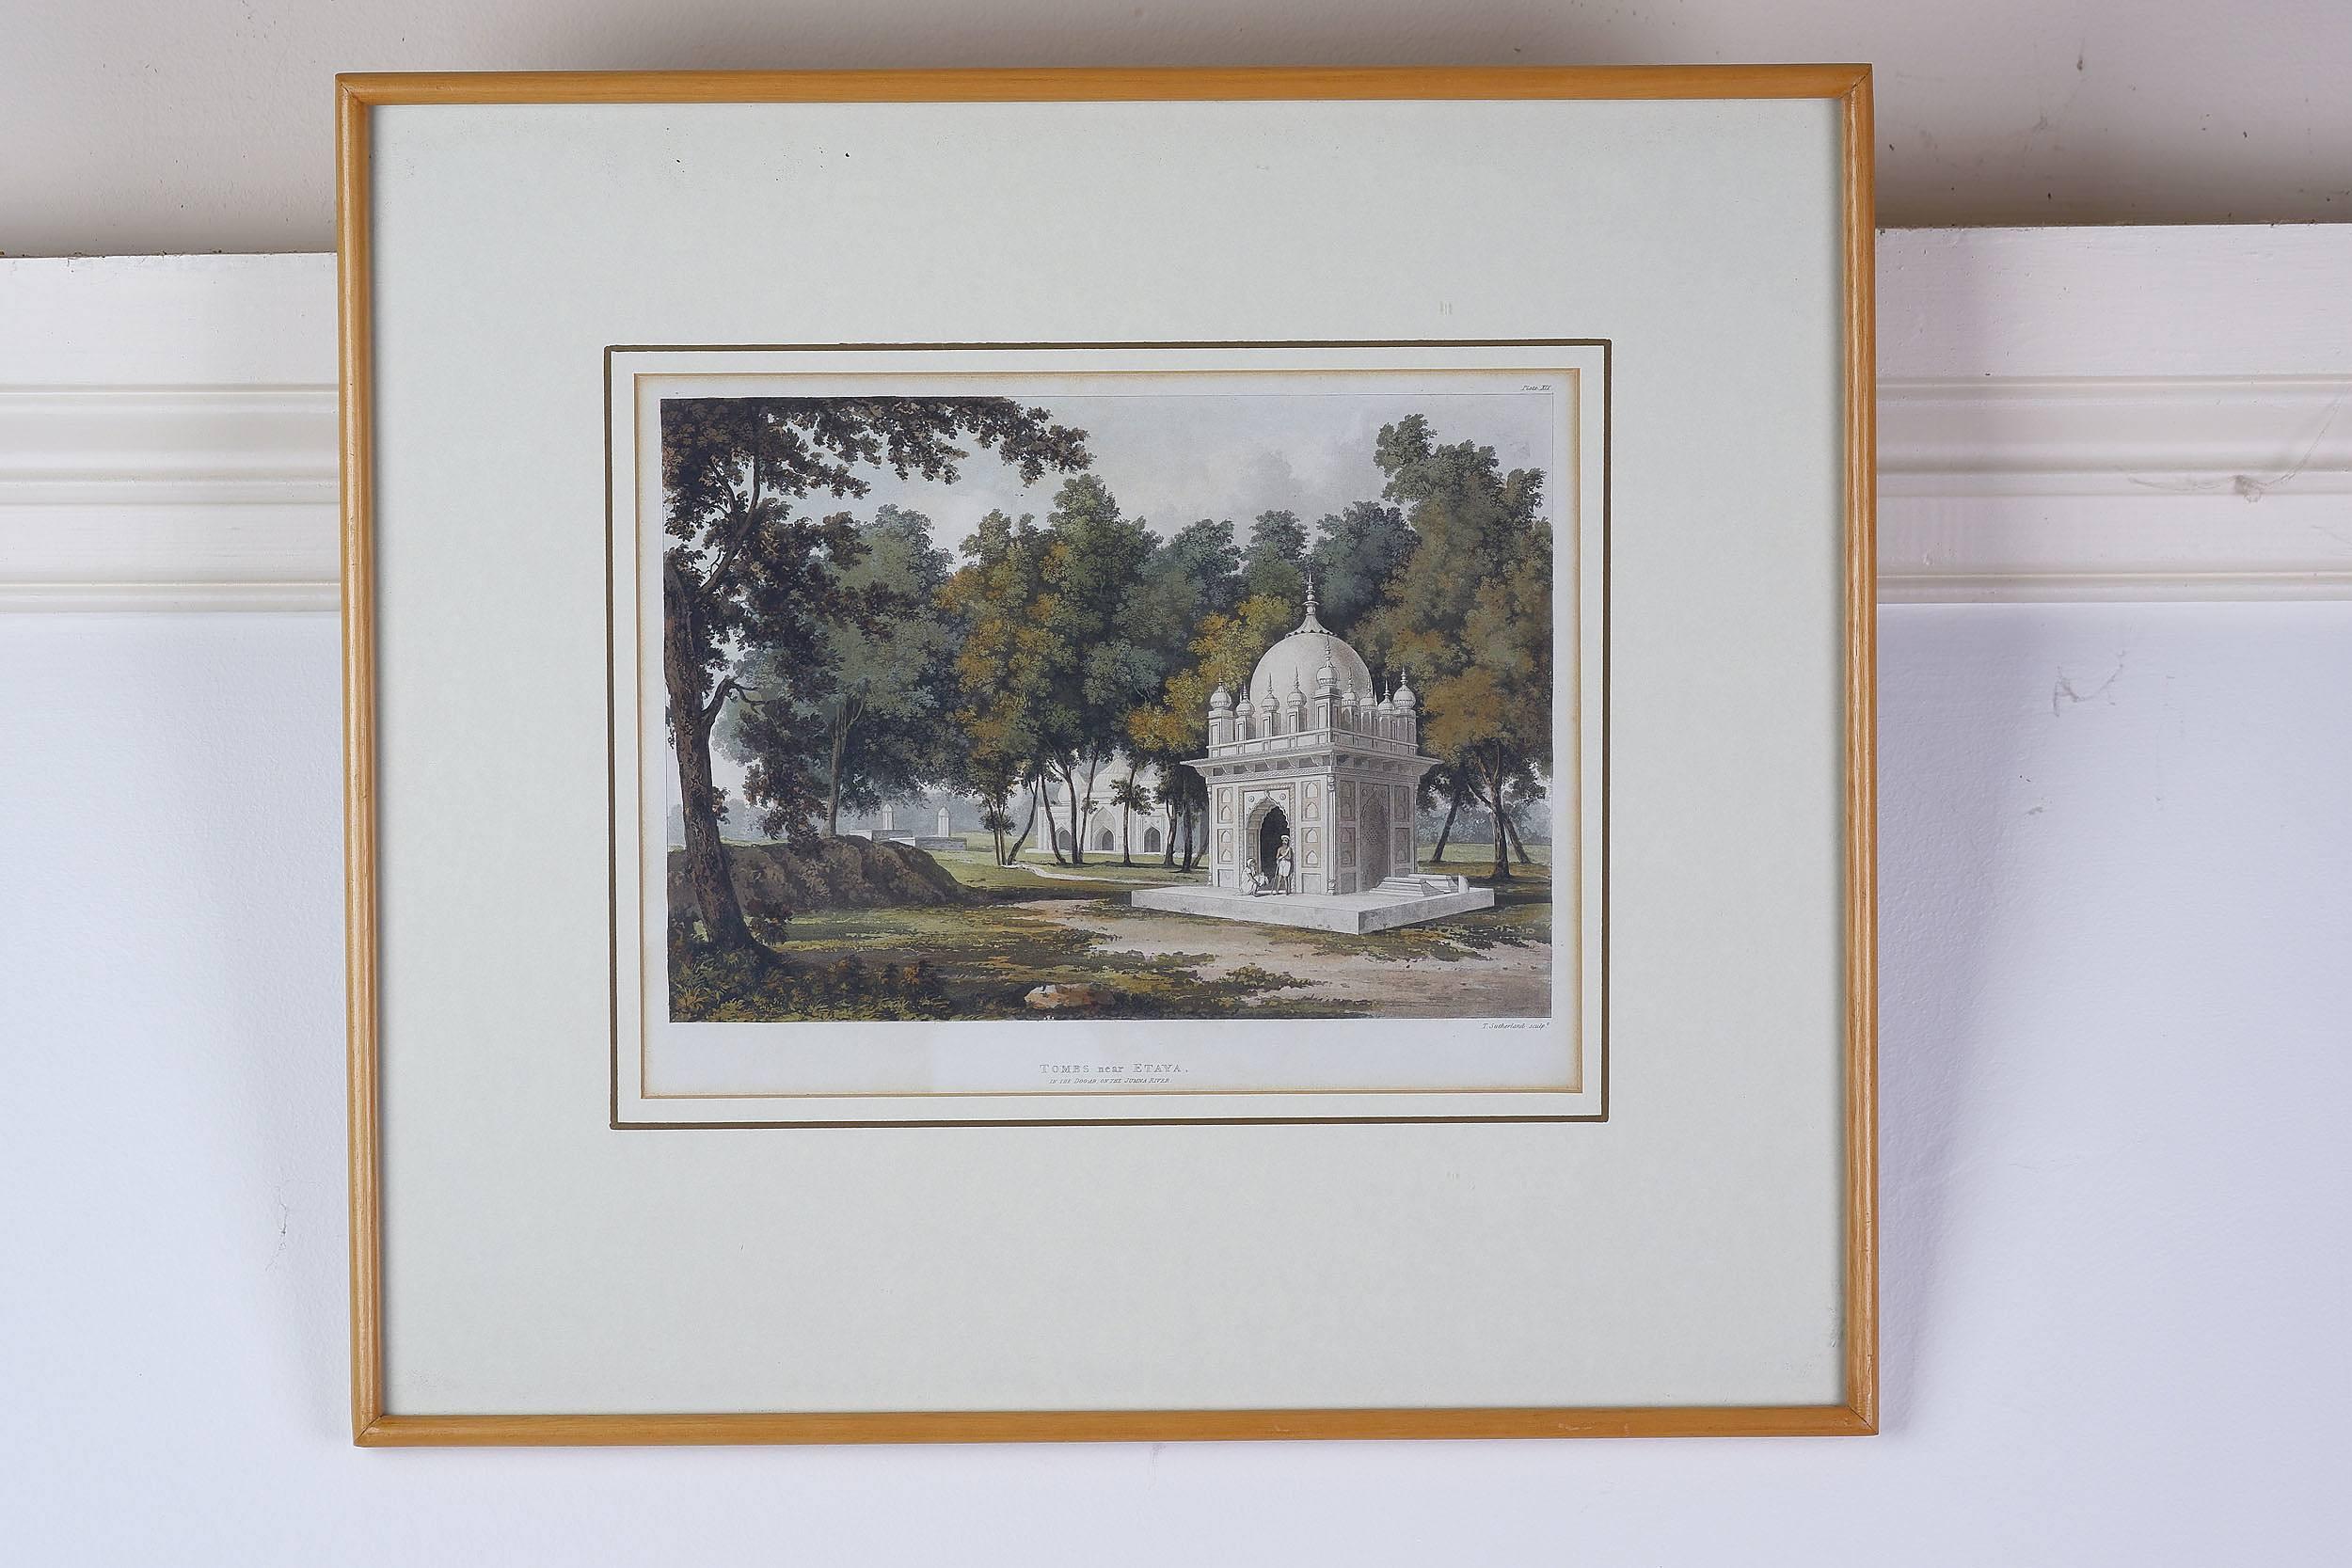 'After Thomas Sutherland, Tombs Near Etaya, Hand Coloured Engraving'